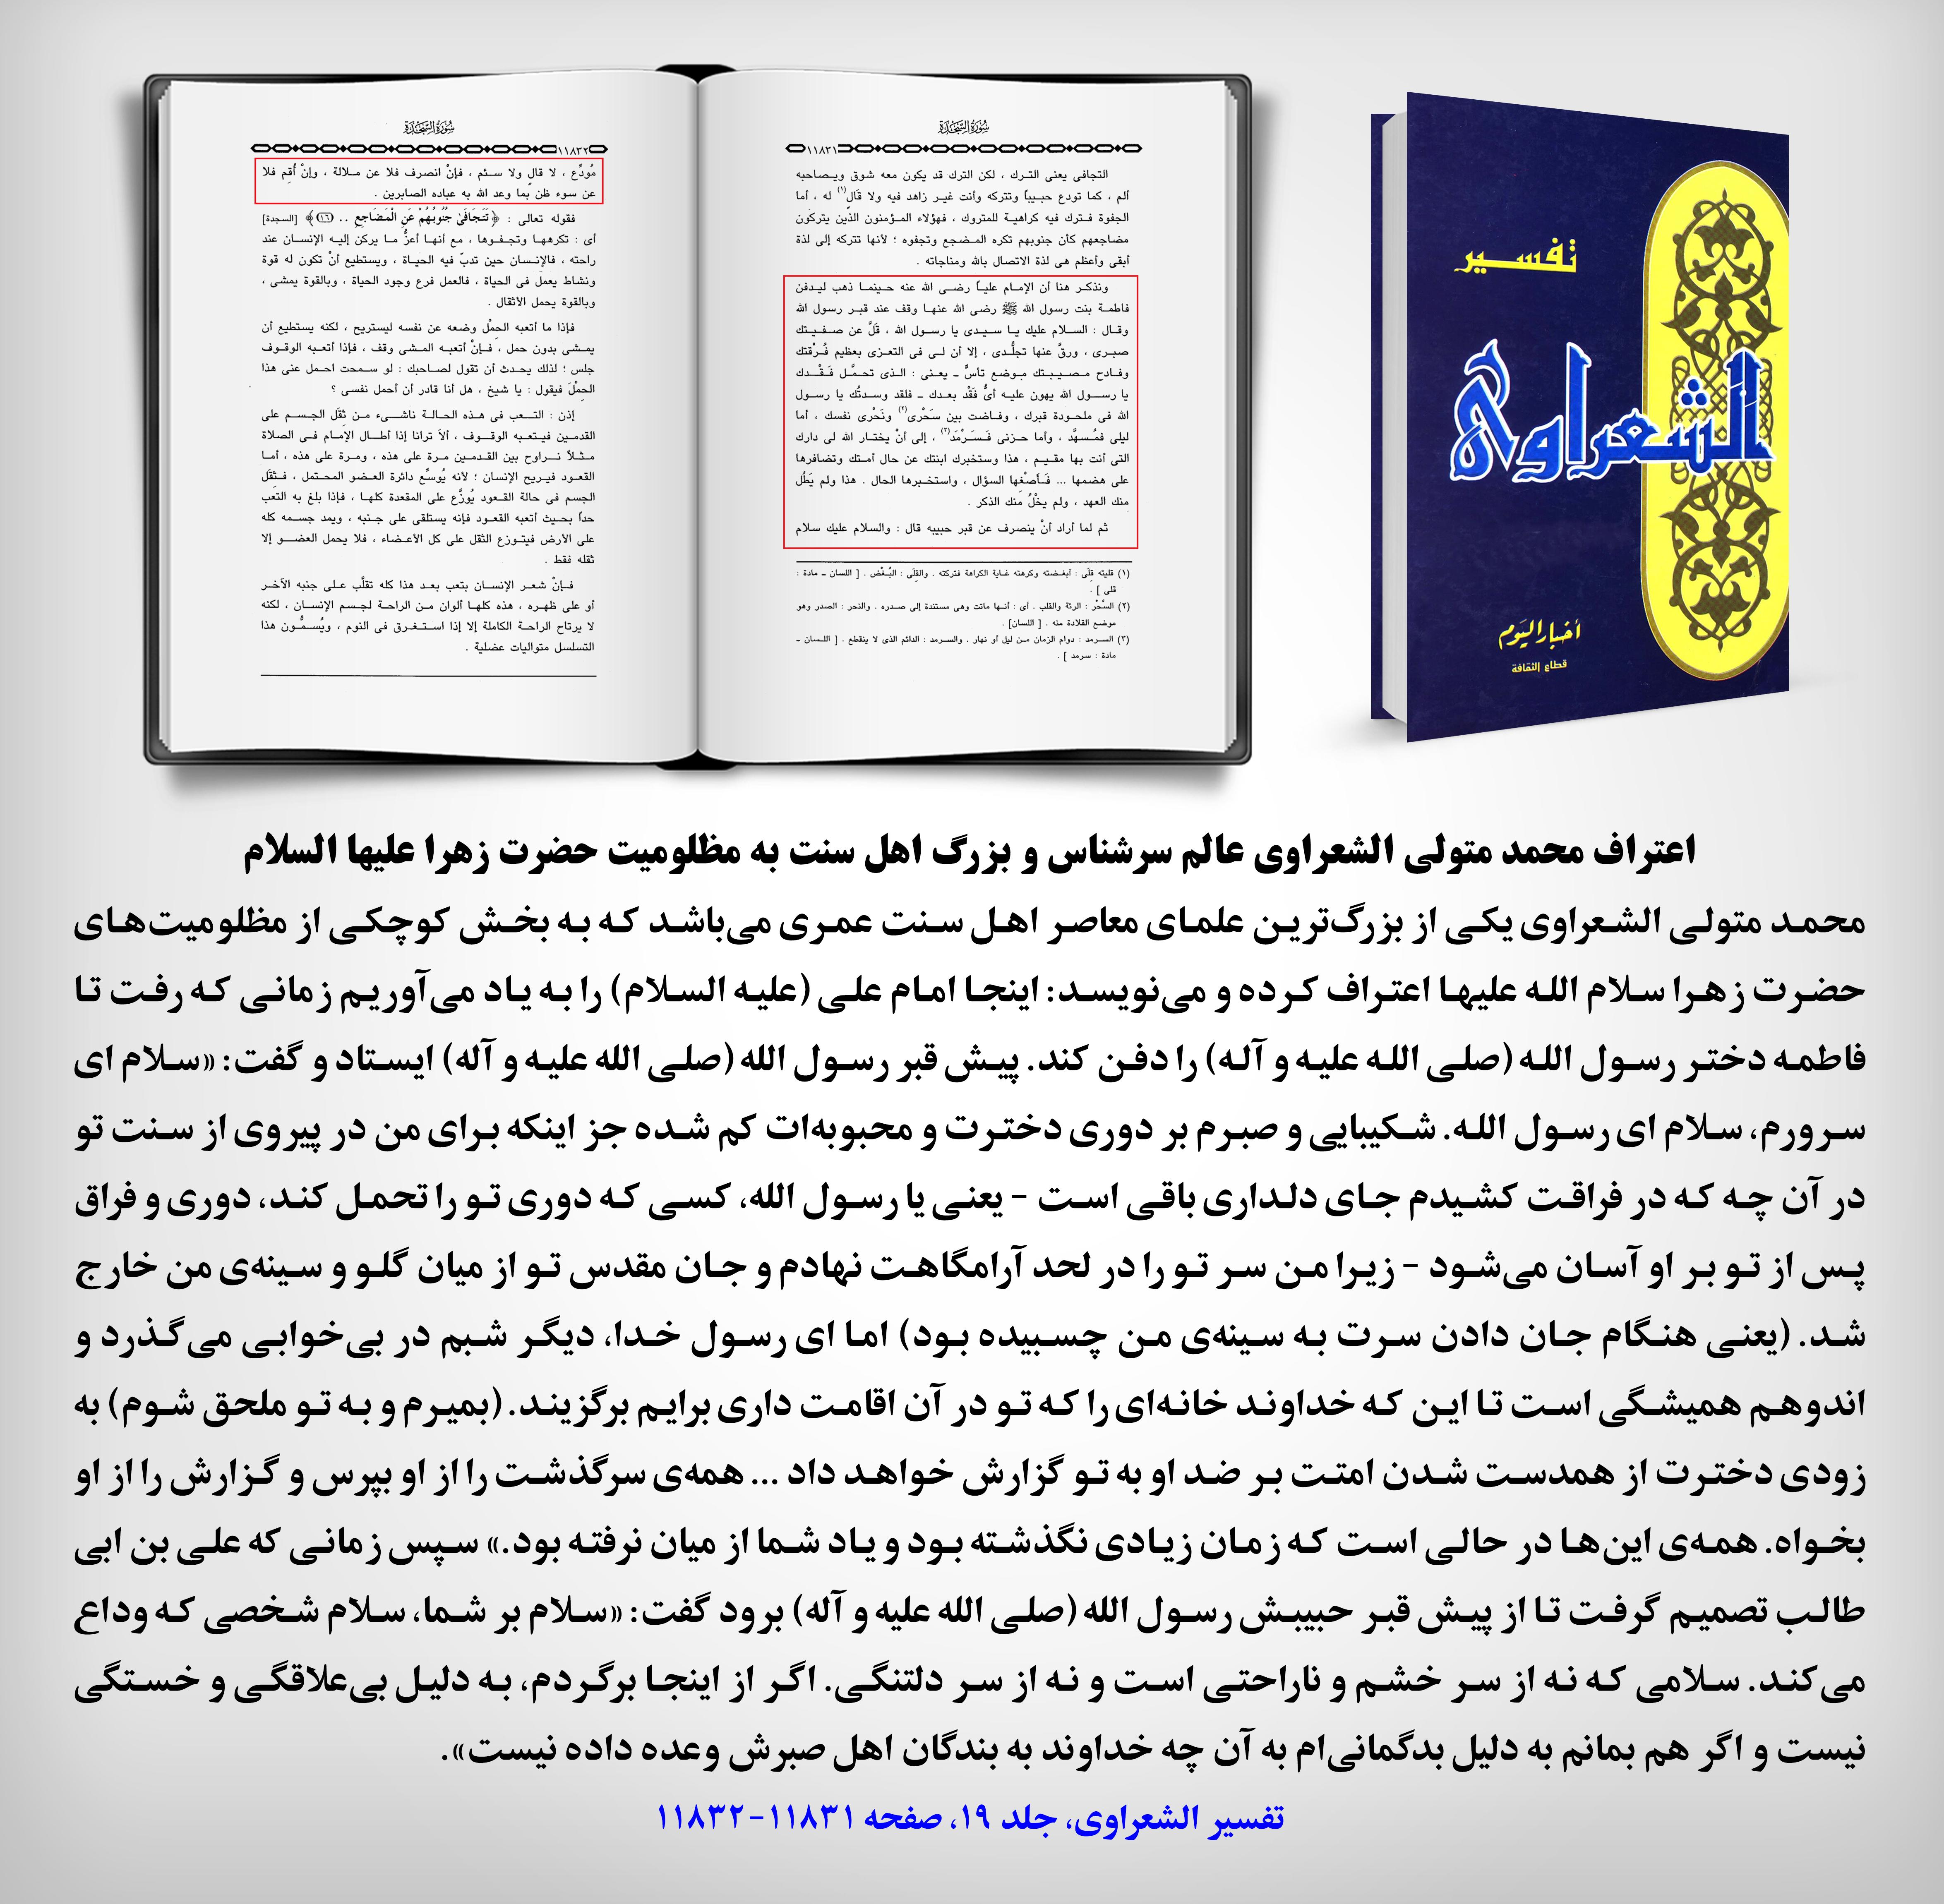 اعتراف عالم سرشناس اهل سنت به مظلومیت حضرت زهرا علیها السلام